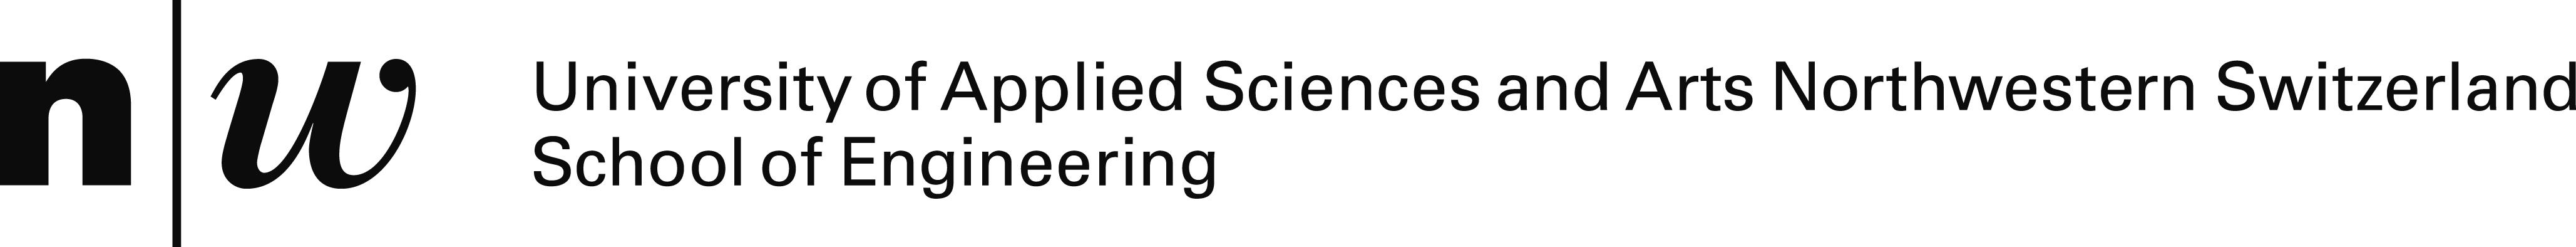 Astroinformatics and Heliophysics Group - Gruppe Astroinformatik und Sonnenphysik